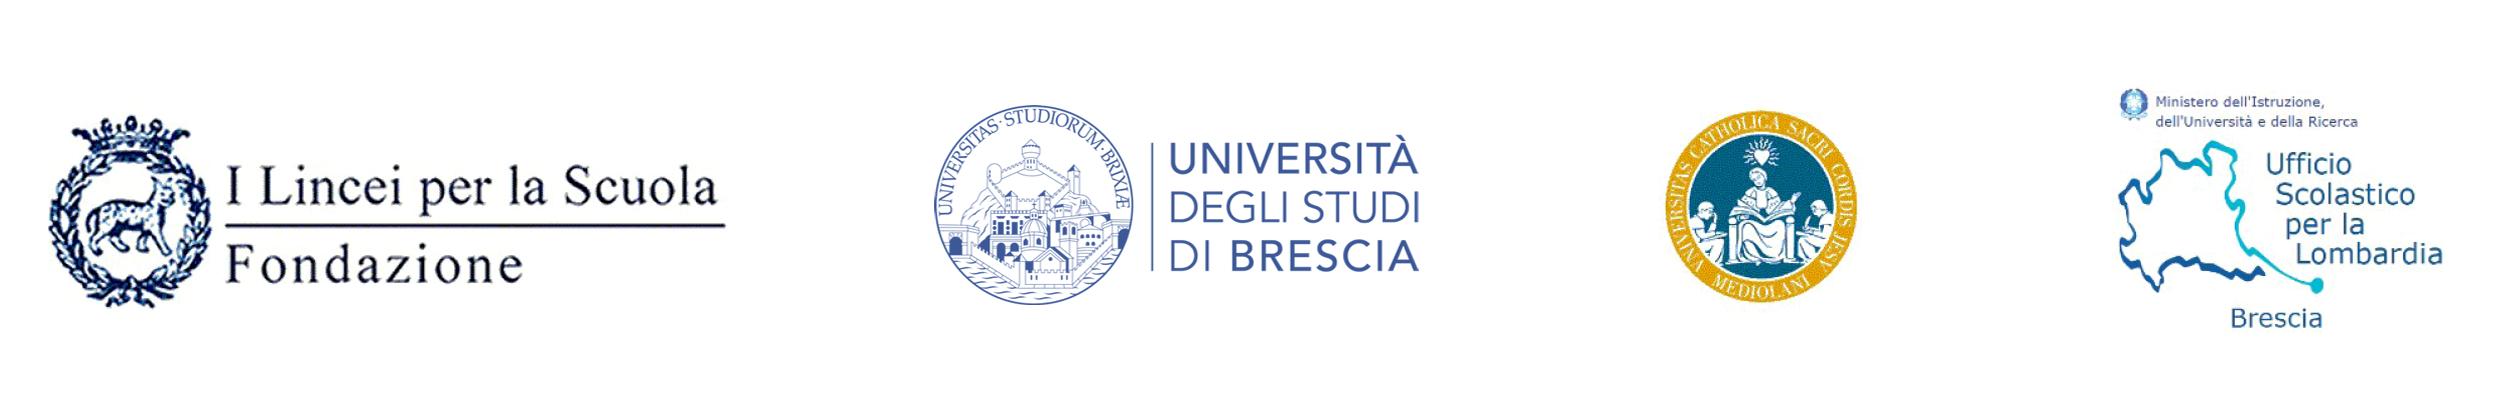 logo istituzioni